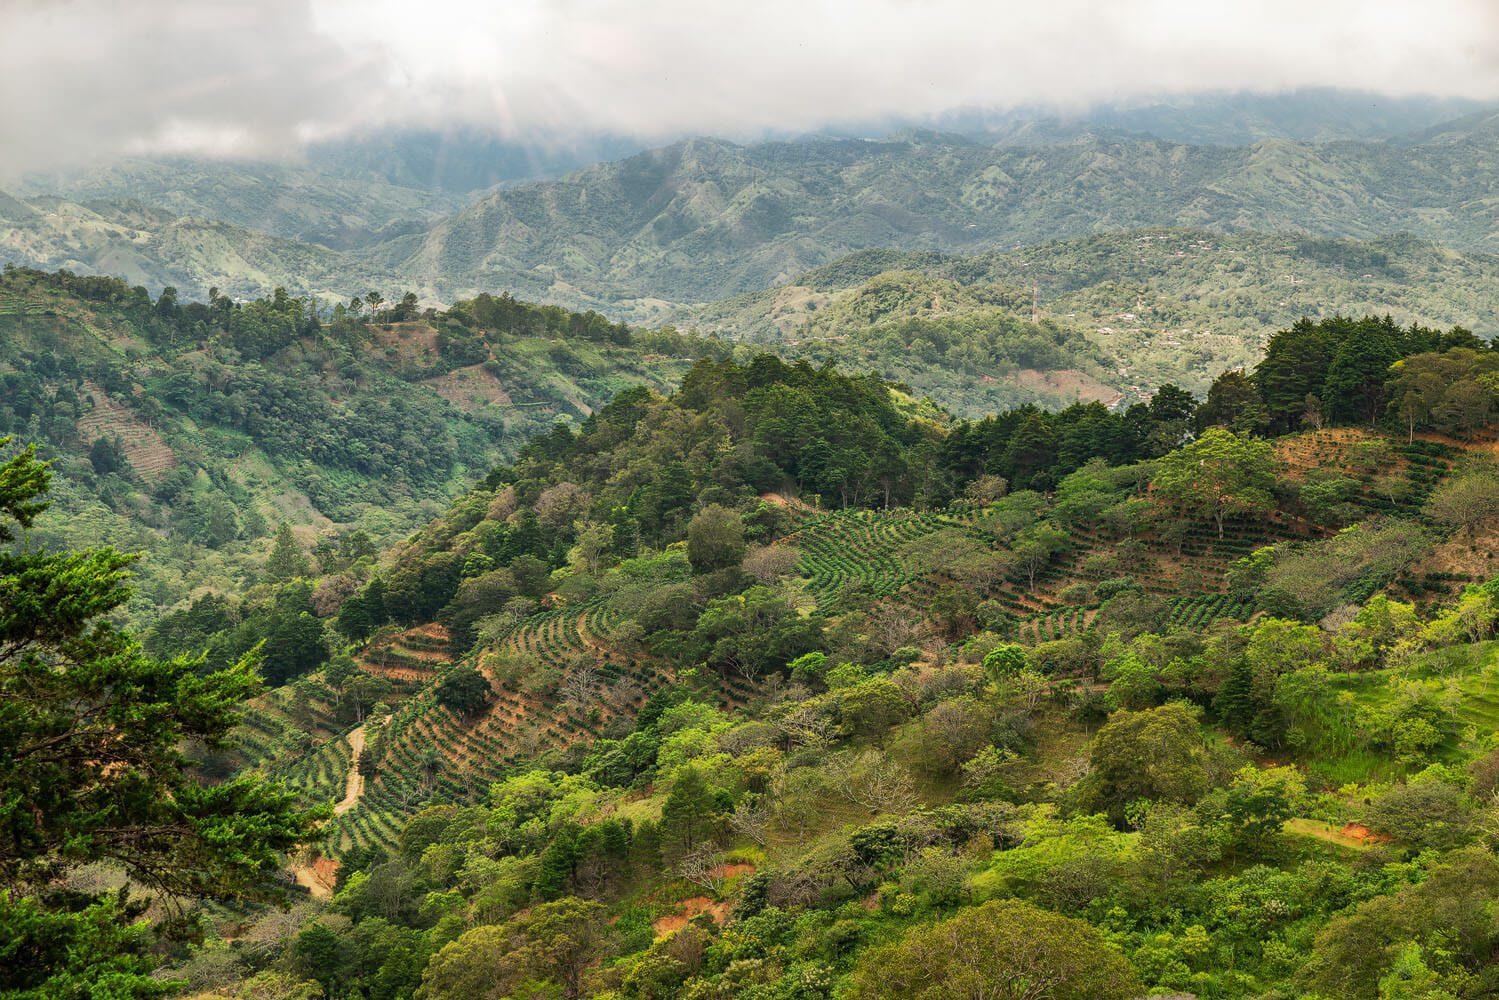 Nacientes Palmichal coffee plantations